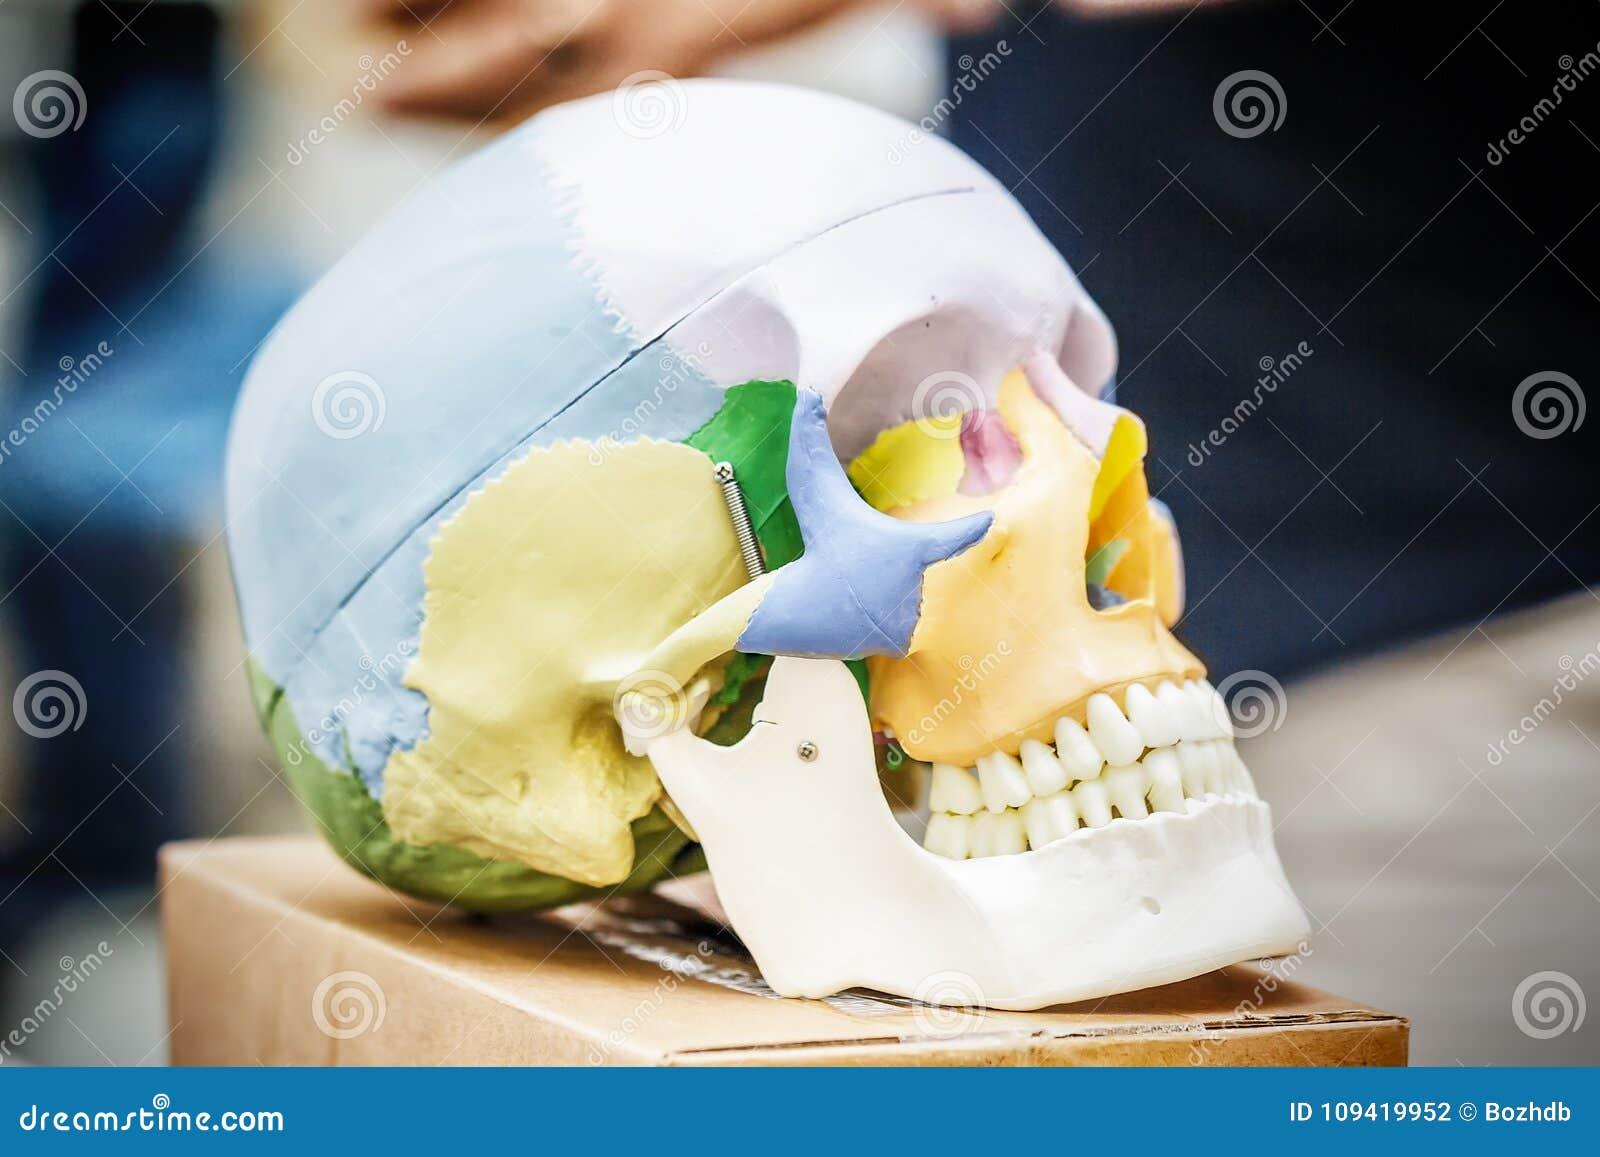 Anatomy human skull model stock photo. Image of biological - 109419952